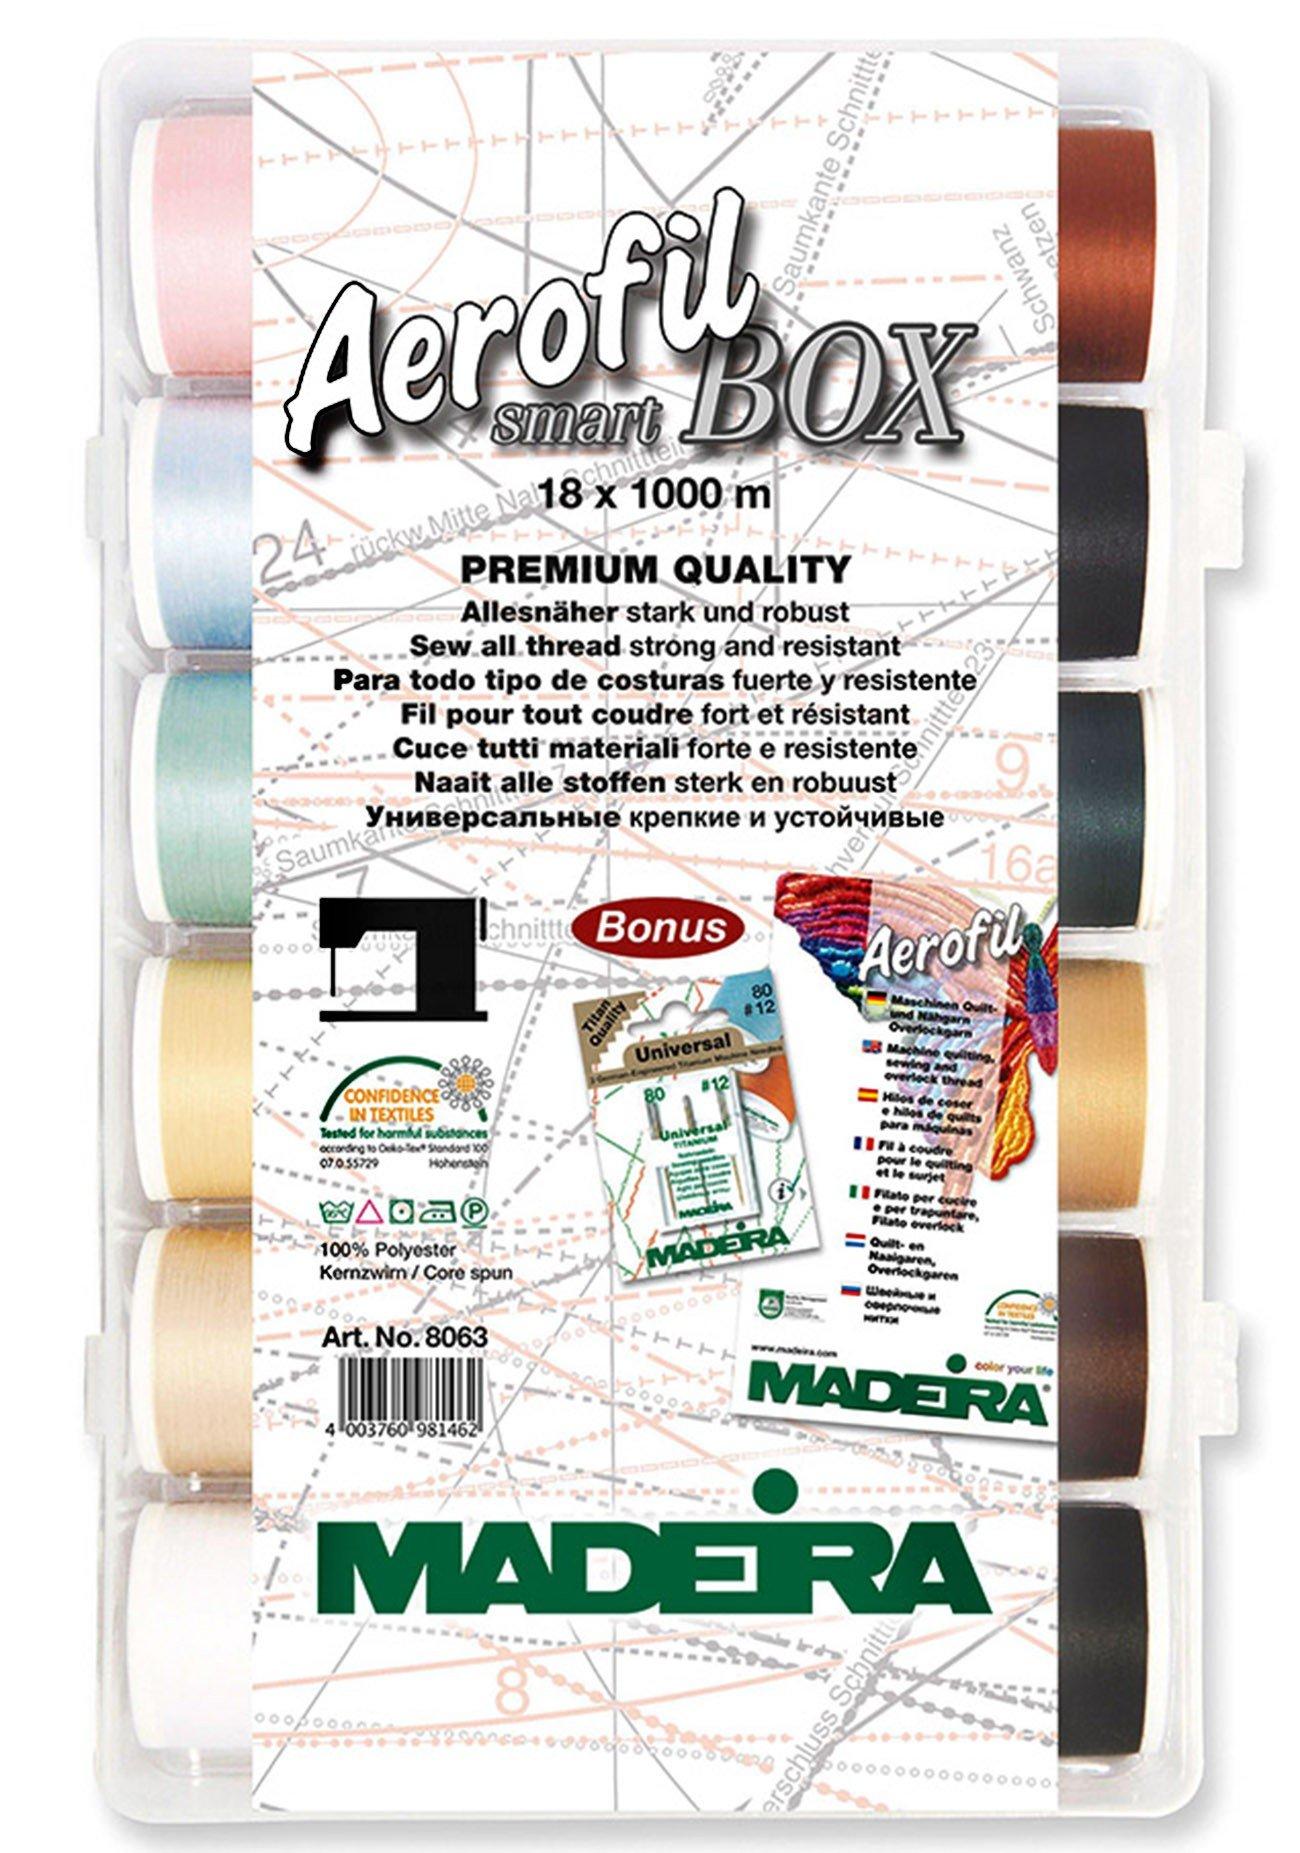 Madeira 91268063 SmartBox Aerofil 120 18 Spool Set, 1100 yd by Madeira